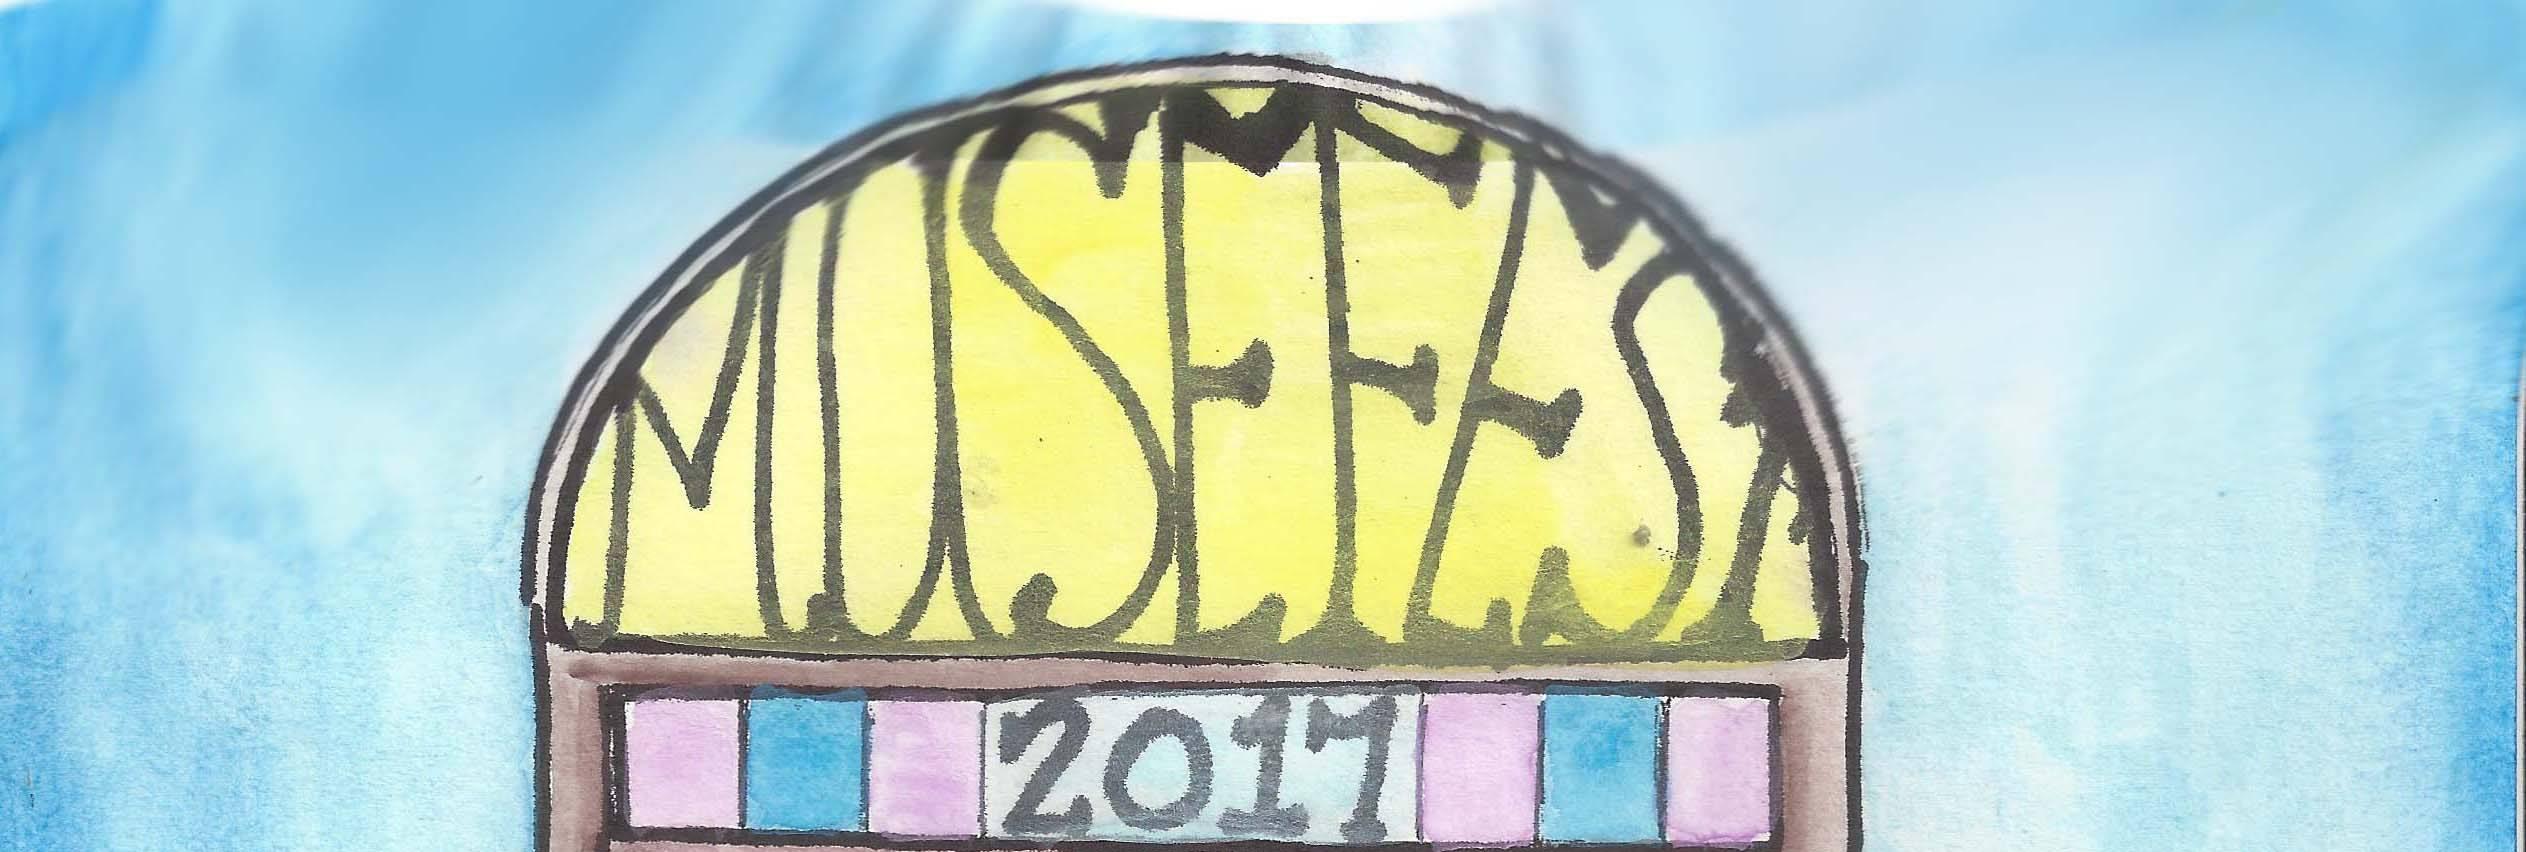 MuseFest